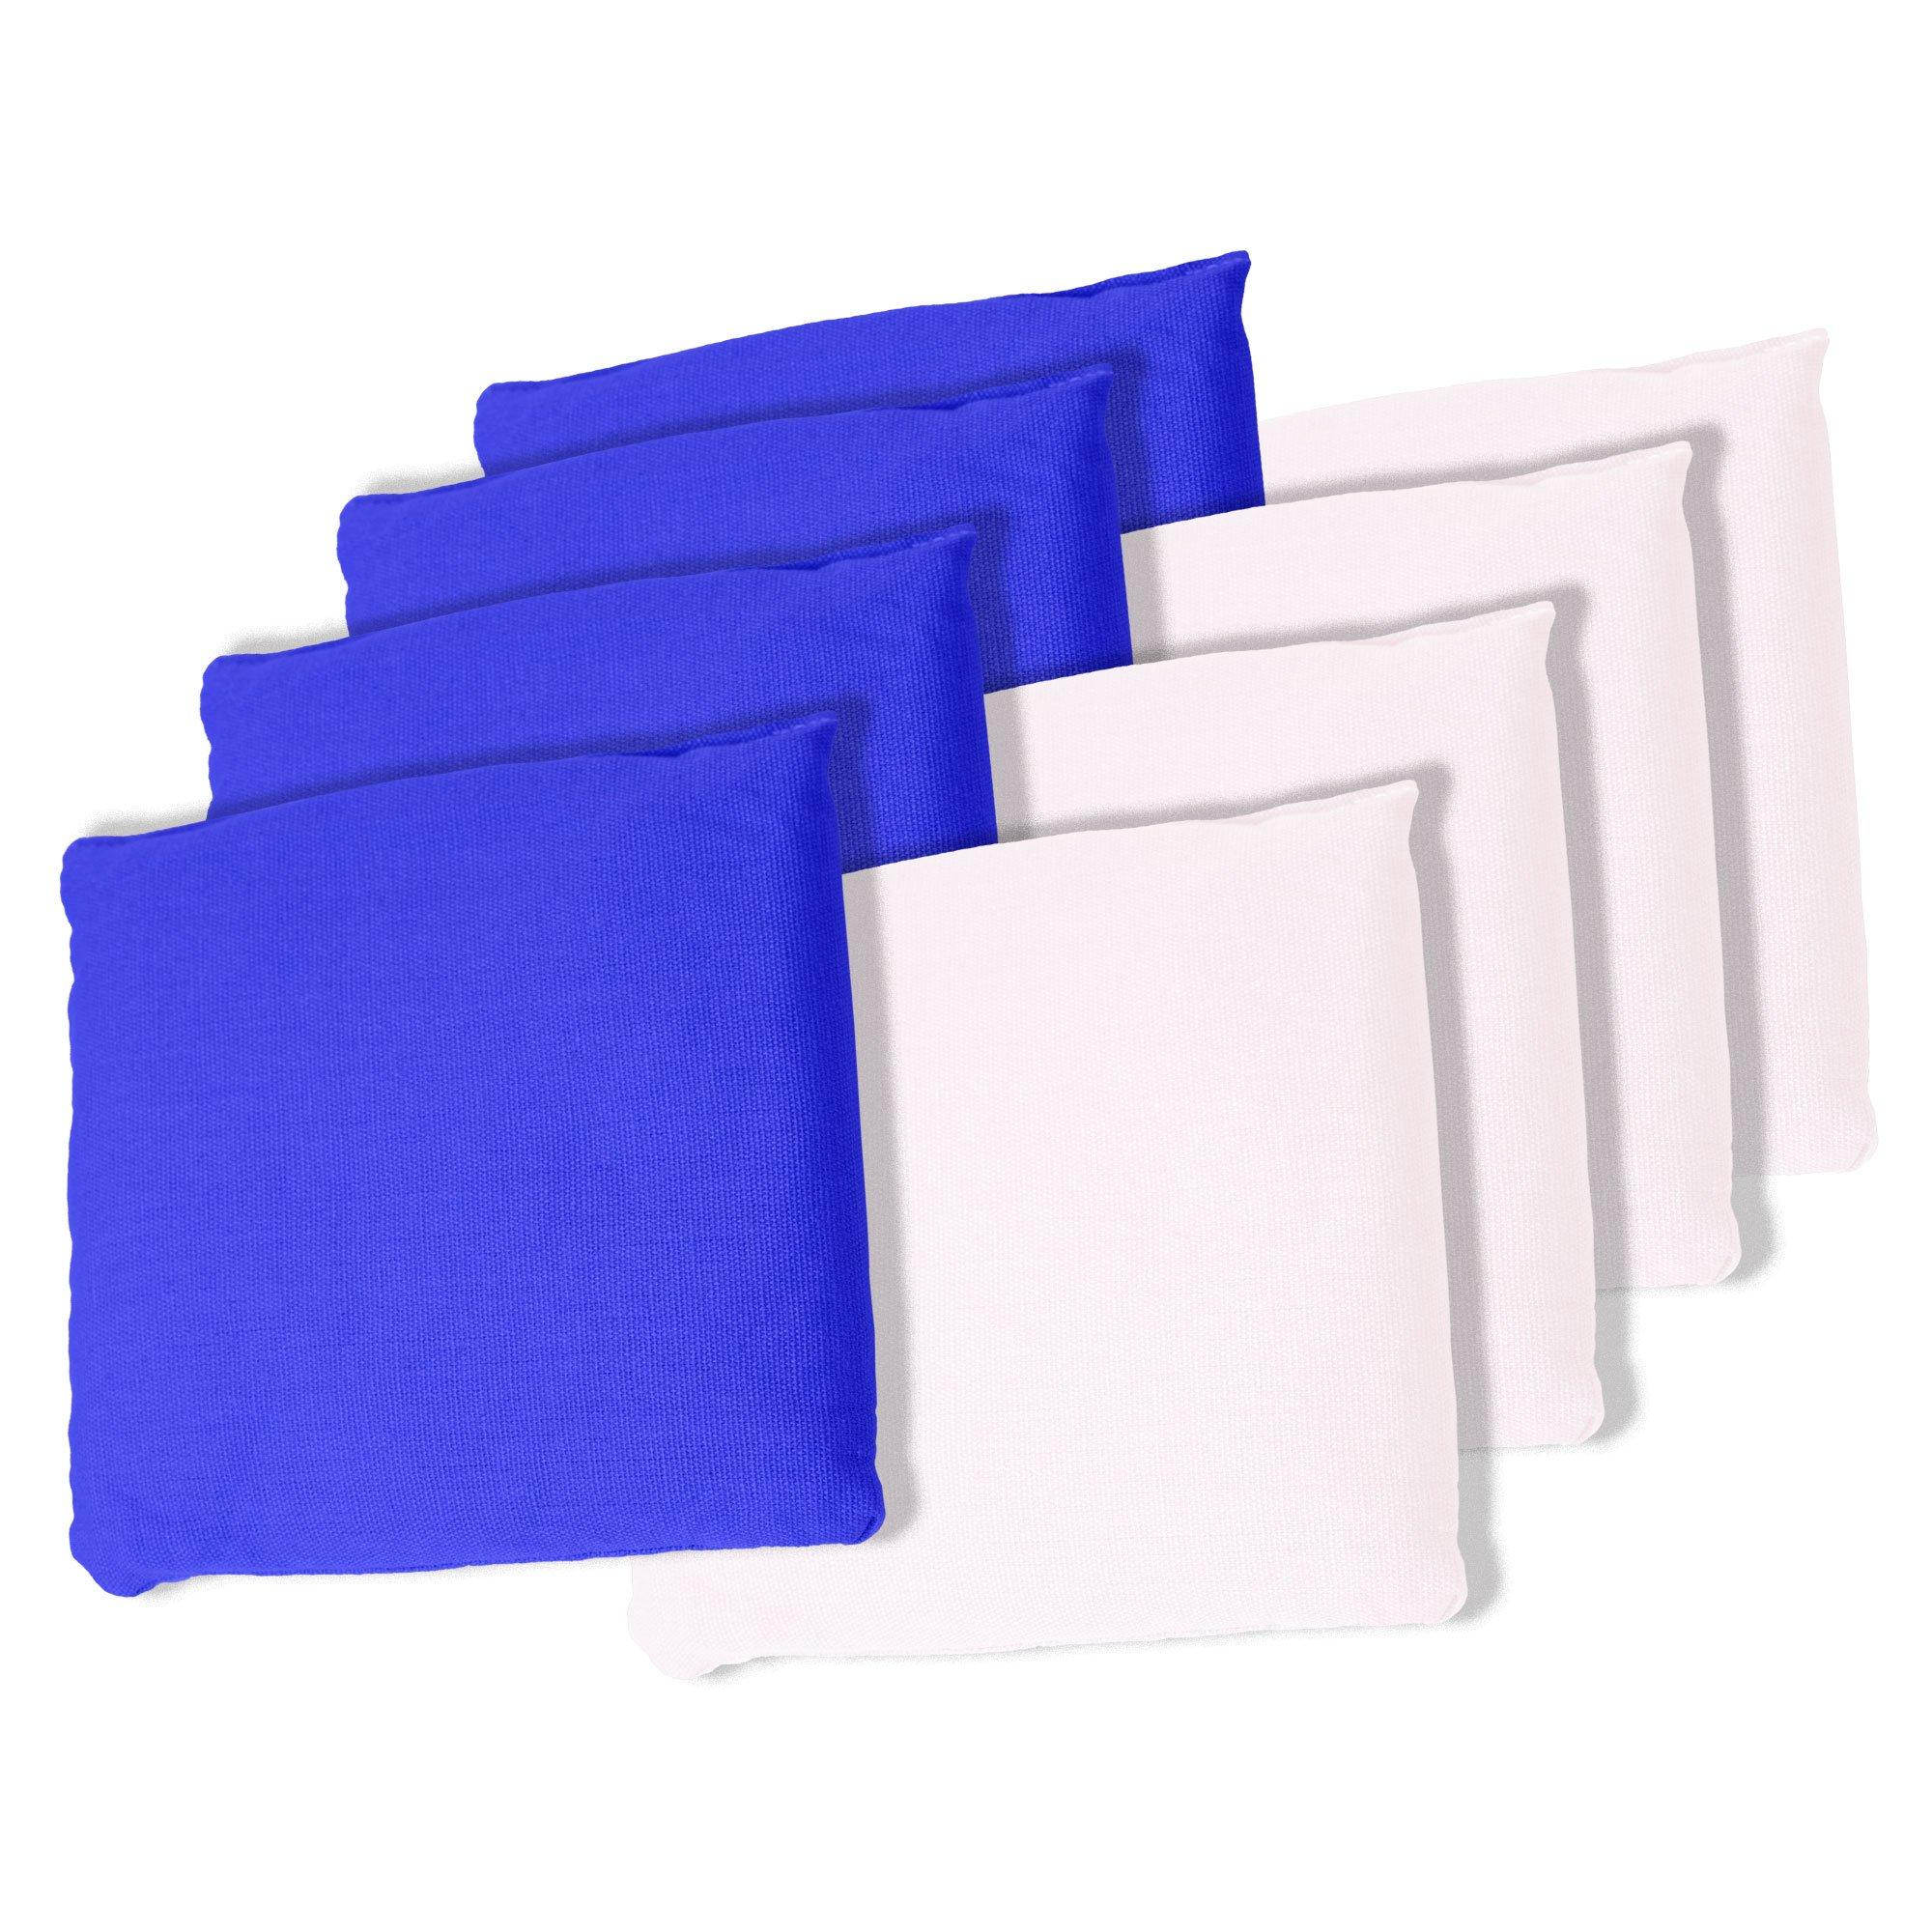 Trademark Games Championship Cornhole Bean Bags (Set of 8), White/Blue